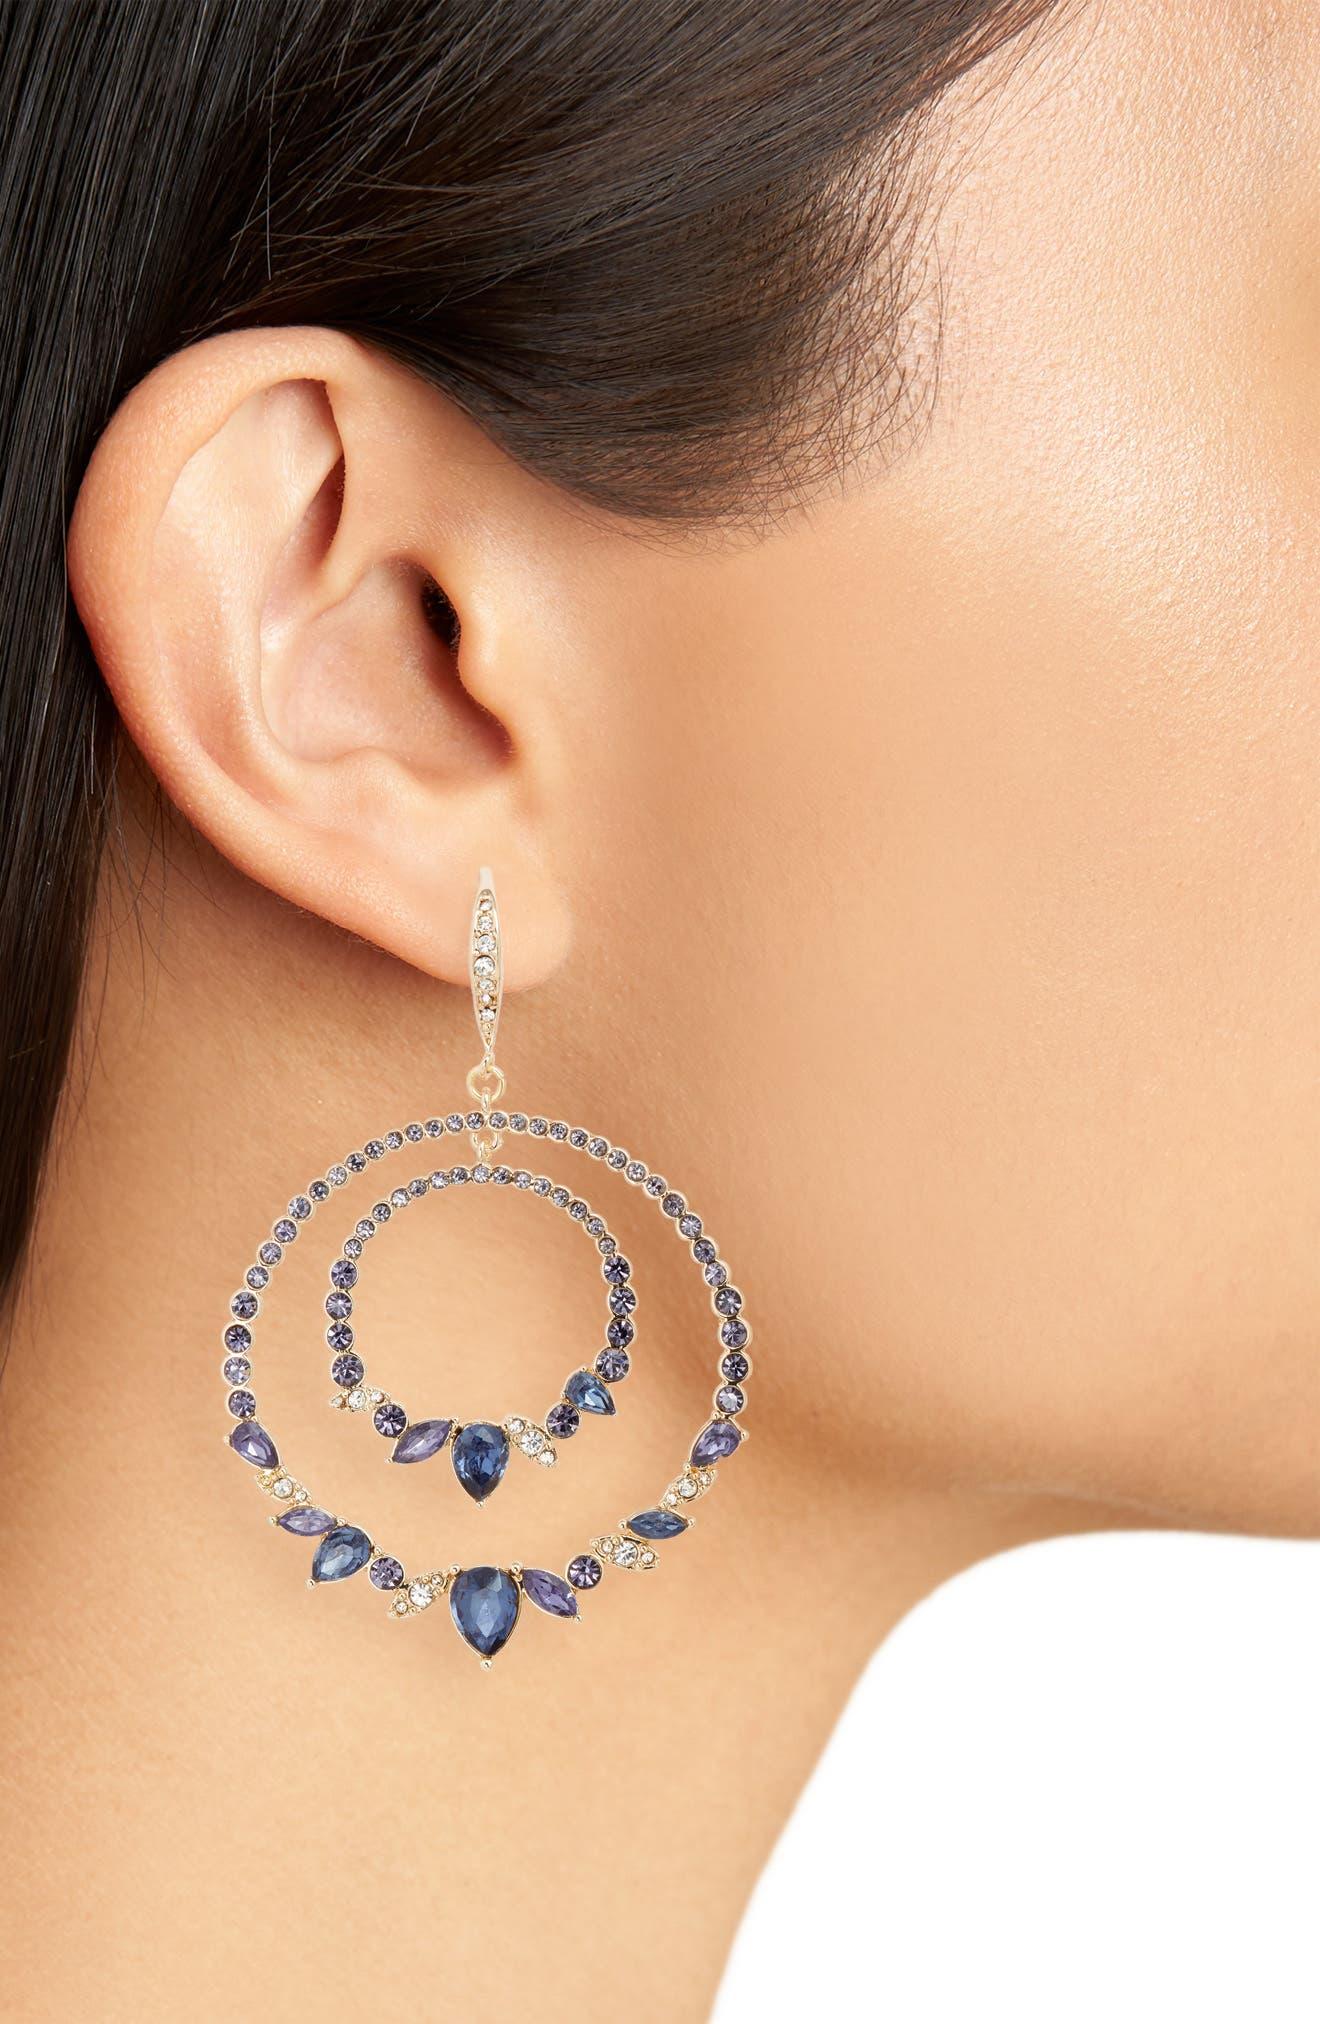 JENNY PACKHAM, Orbital Crystal Drop Earrings, Alternate thumbnail 2, color, PURPLE/ GOLD